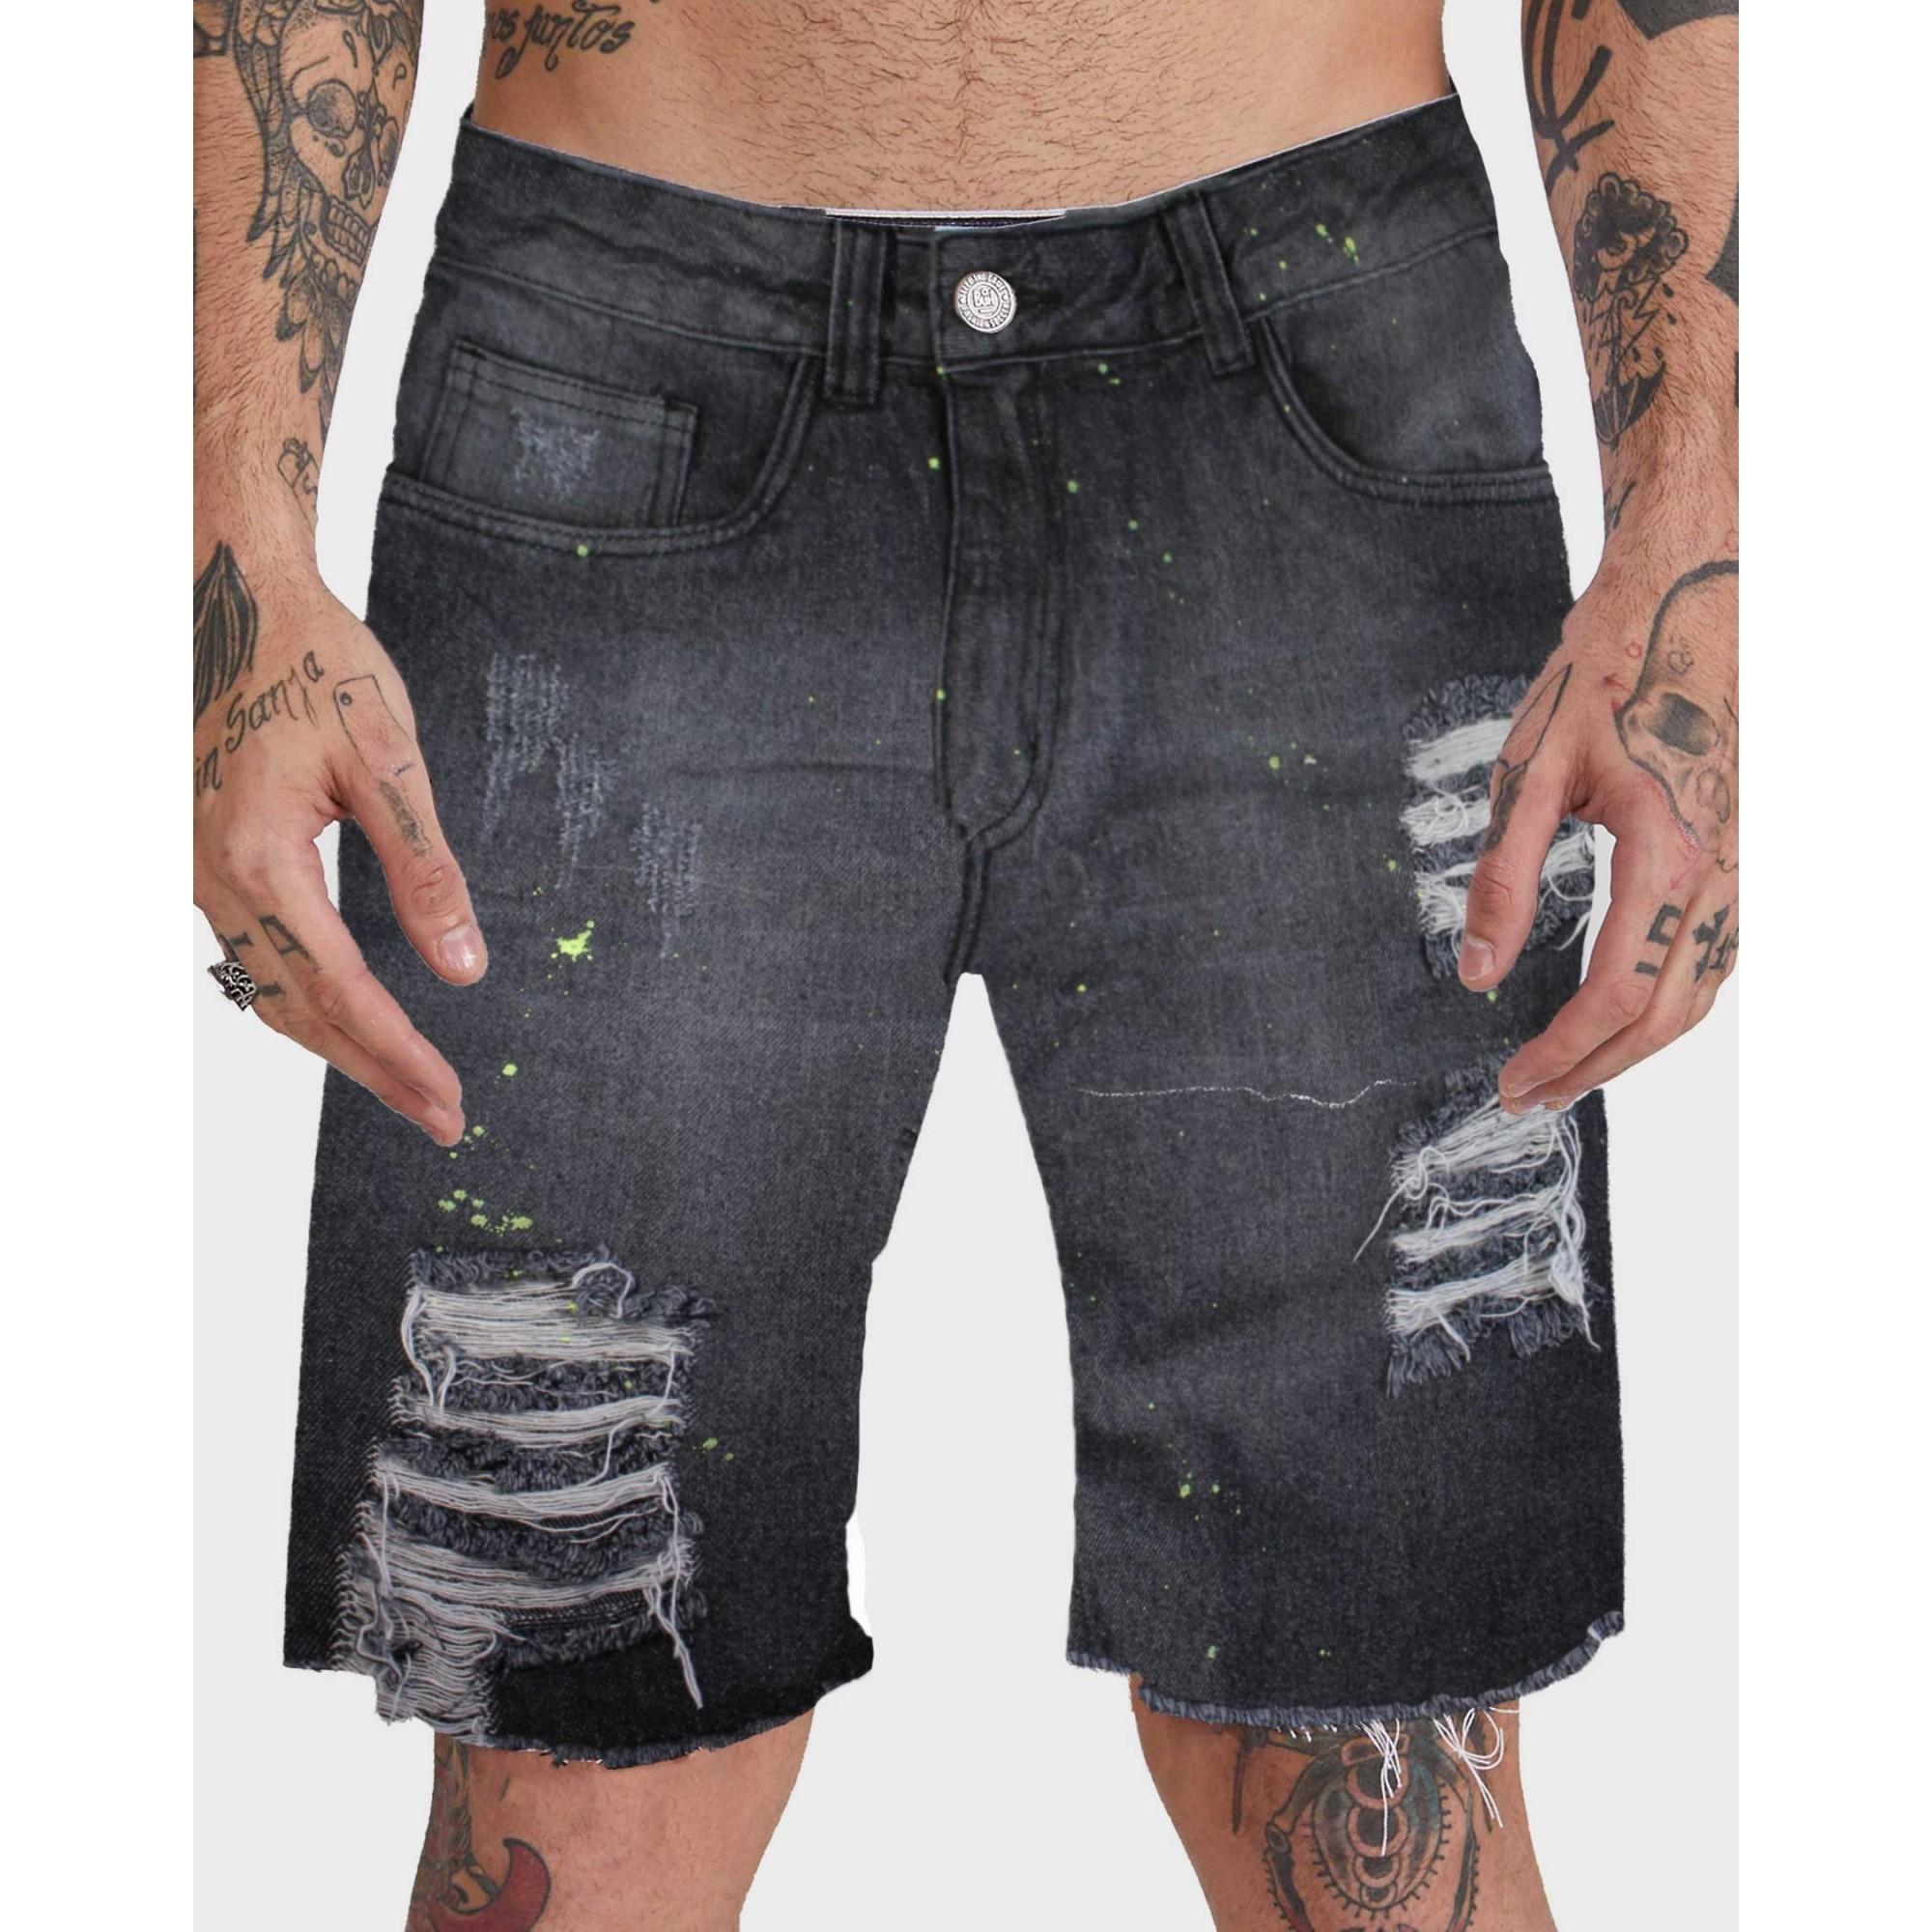 Bermuda Buh Jeans Respingo Black